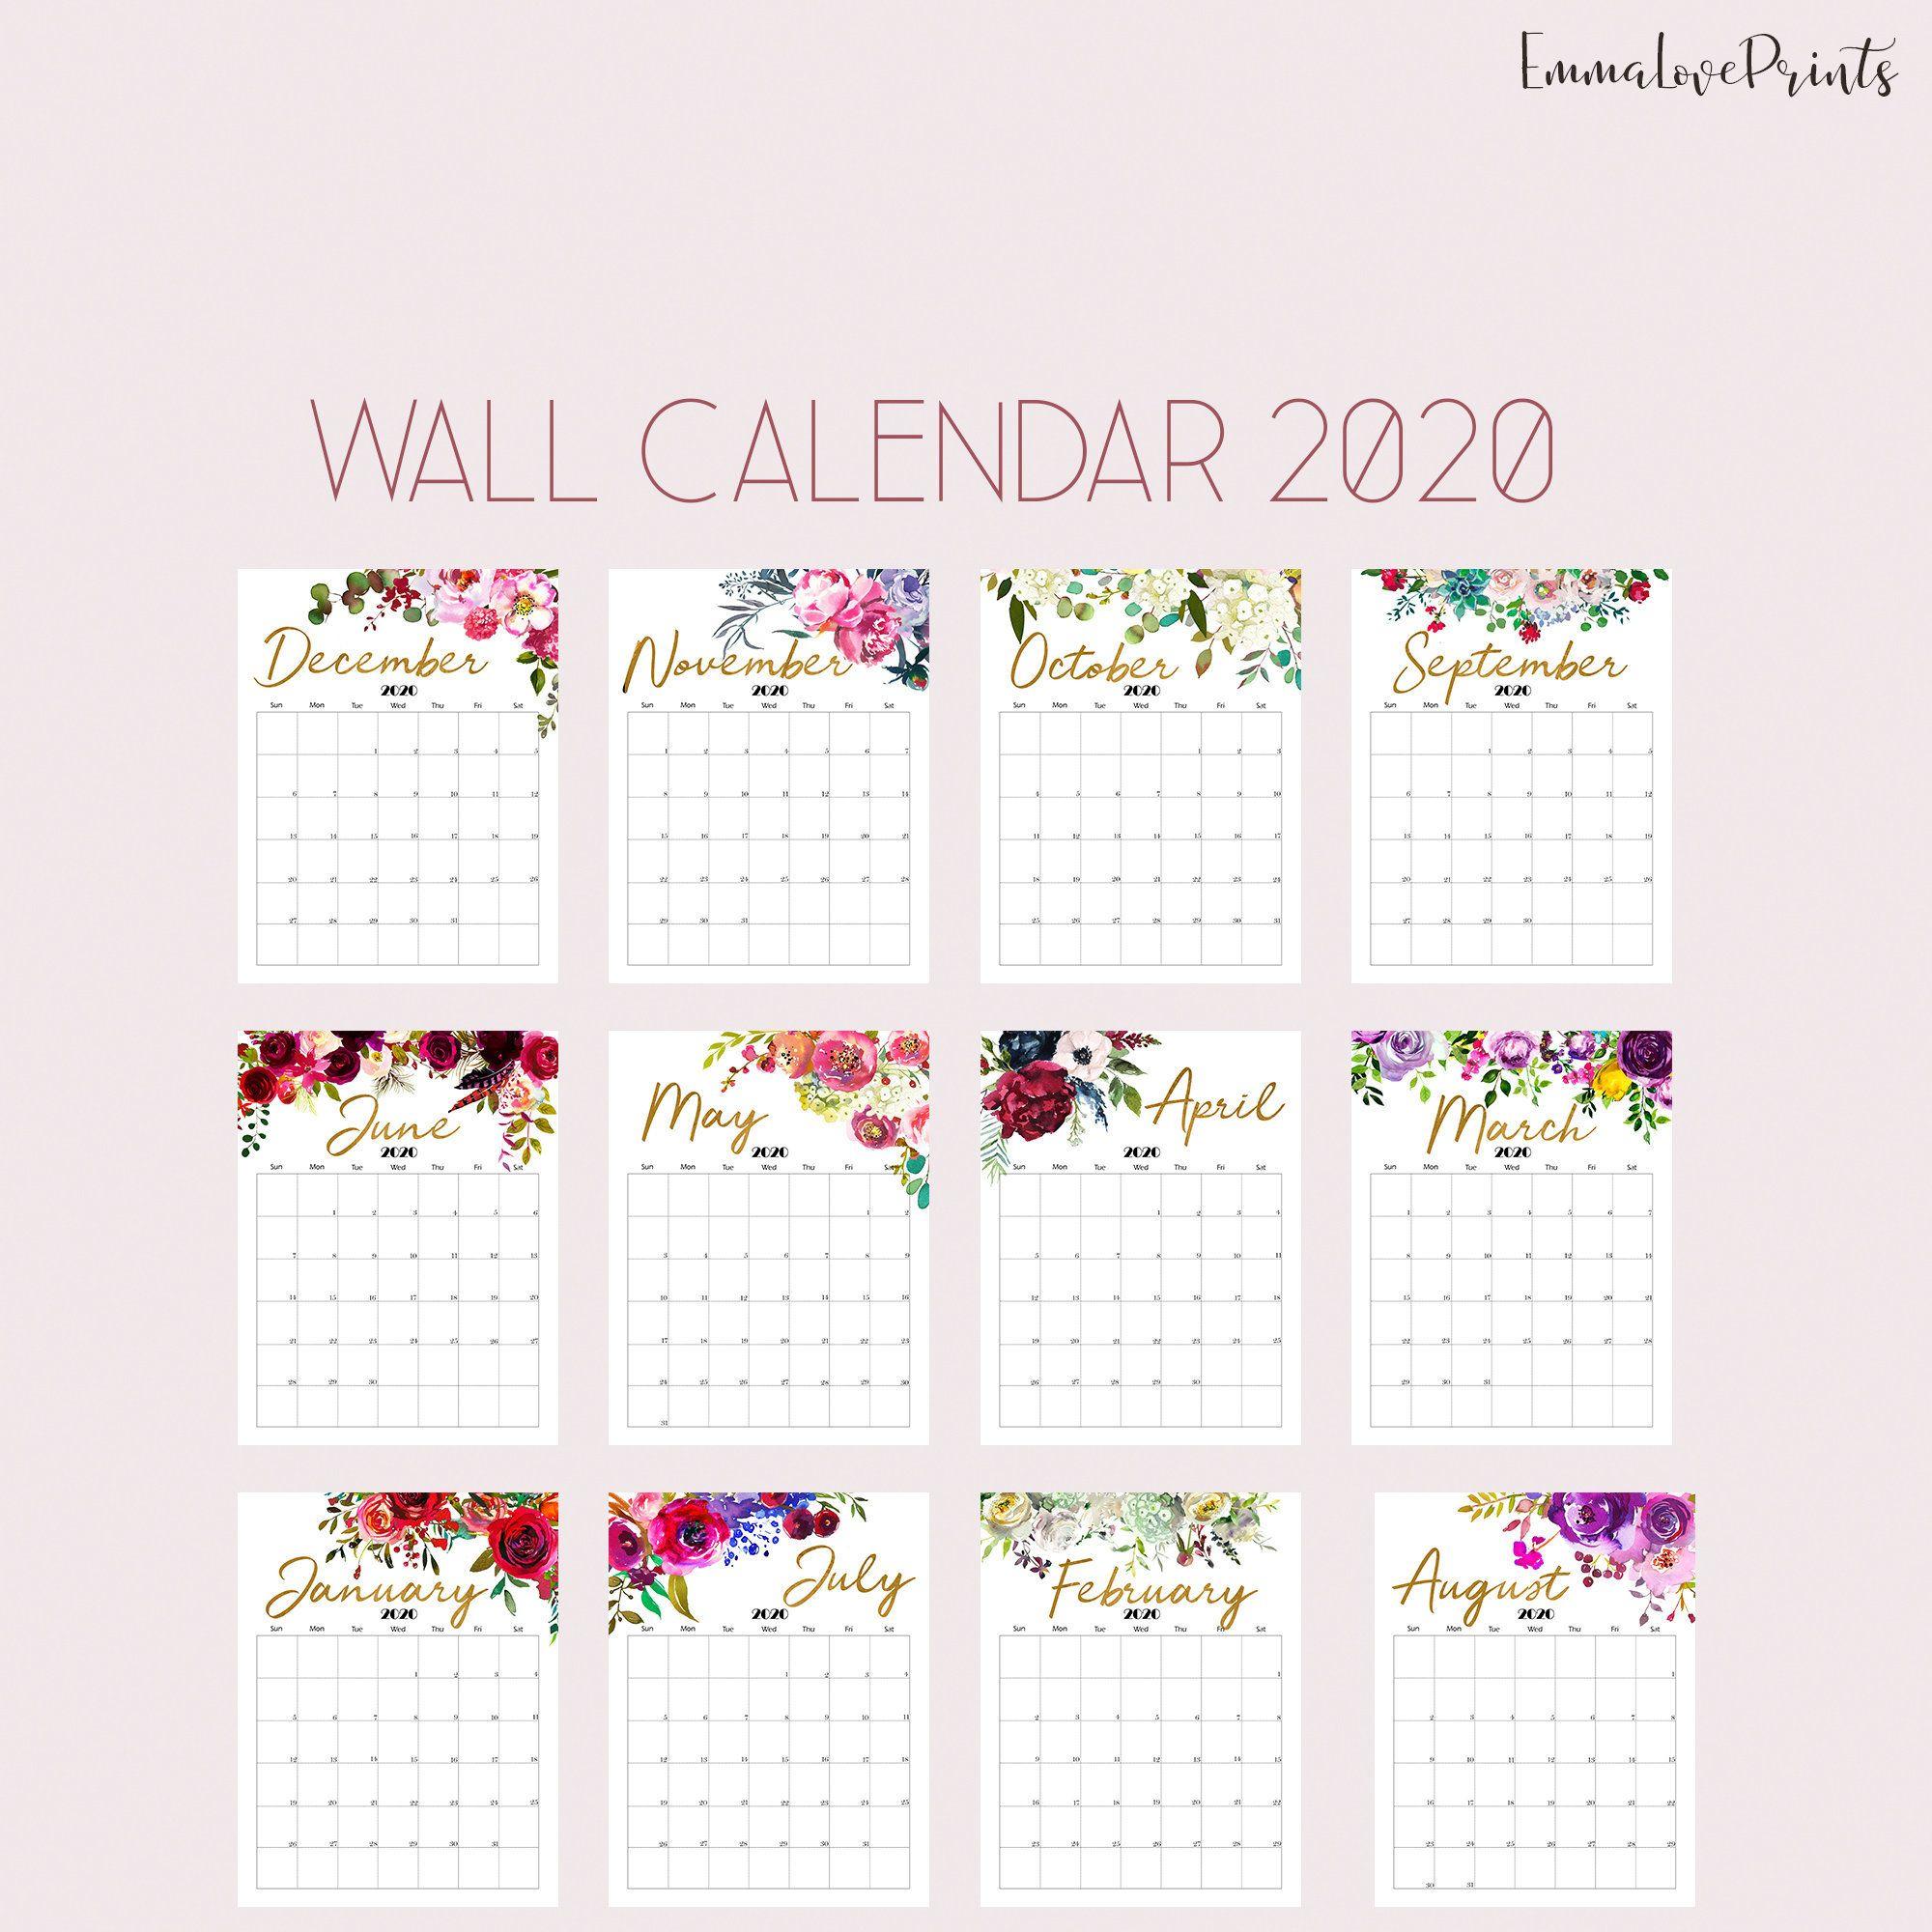 Printable Calendar 2020 Wall Calendar 2020 Desk Calendar, Floral inside Printable 8.5 X 11 2020 Calendar